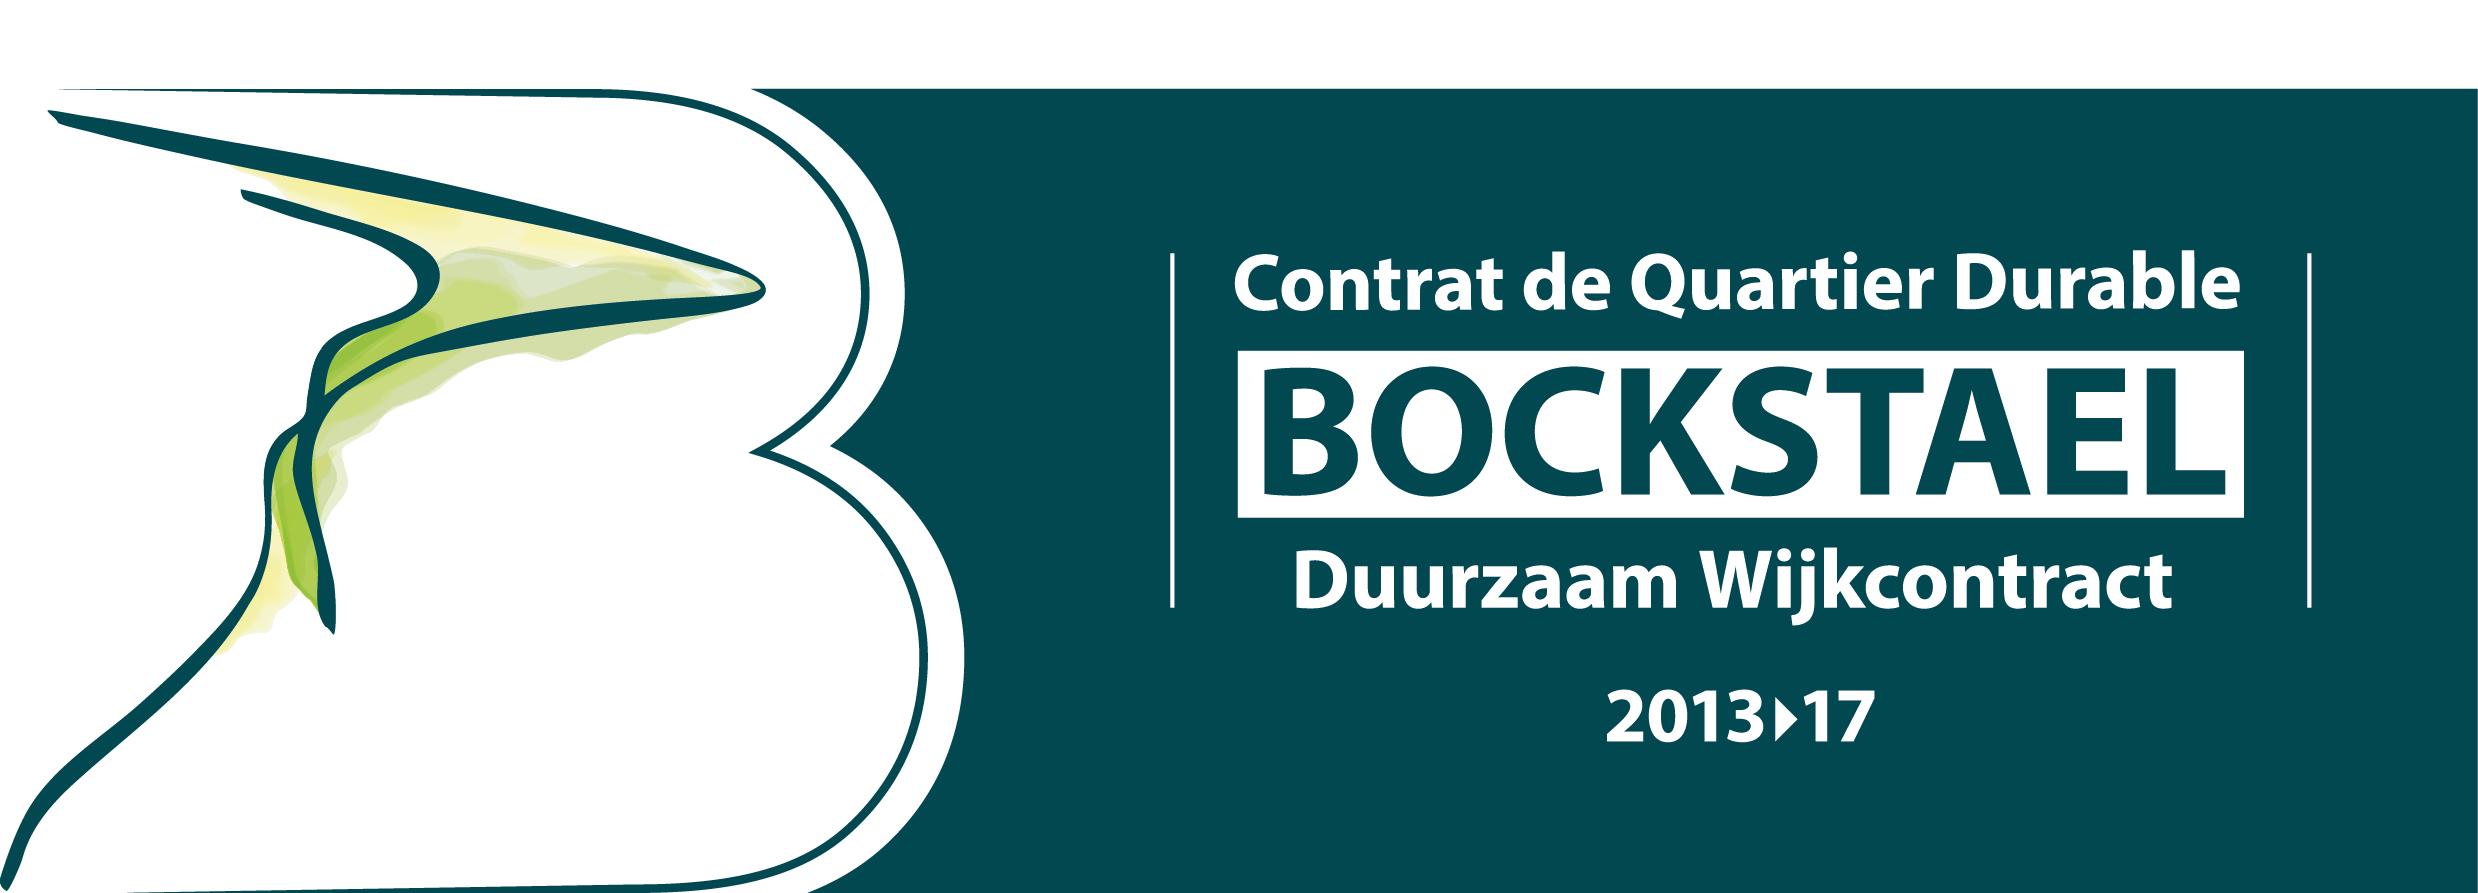 Contrat de Quartier Durable Bockstael